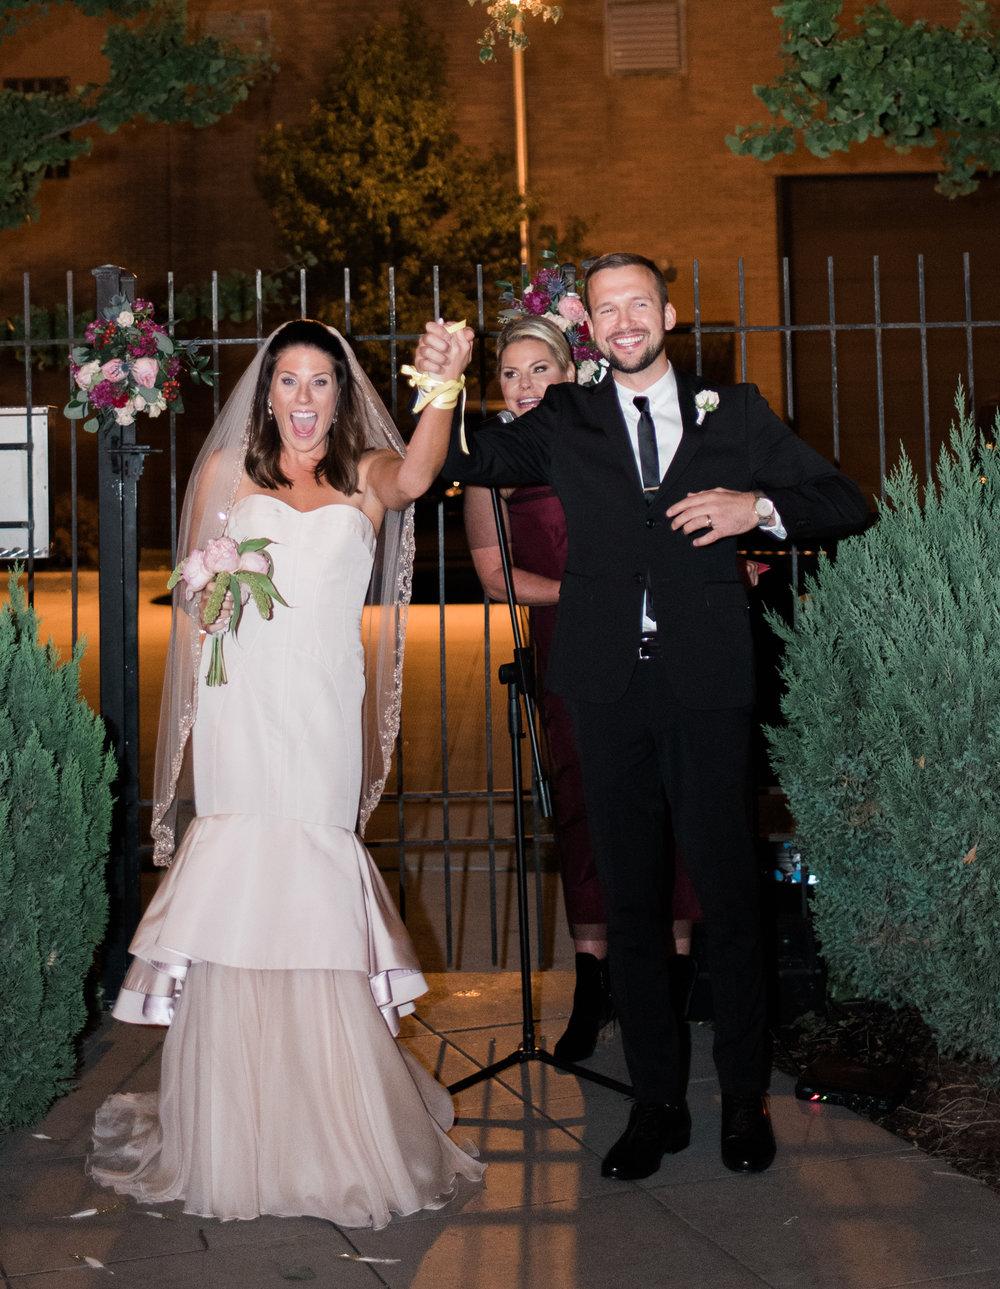 Bonphotage Chicago Fine Art Wedding Photography - Concord 55